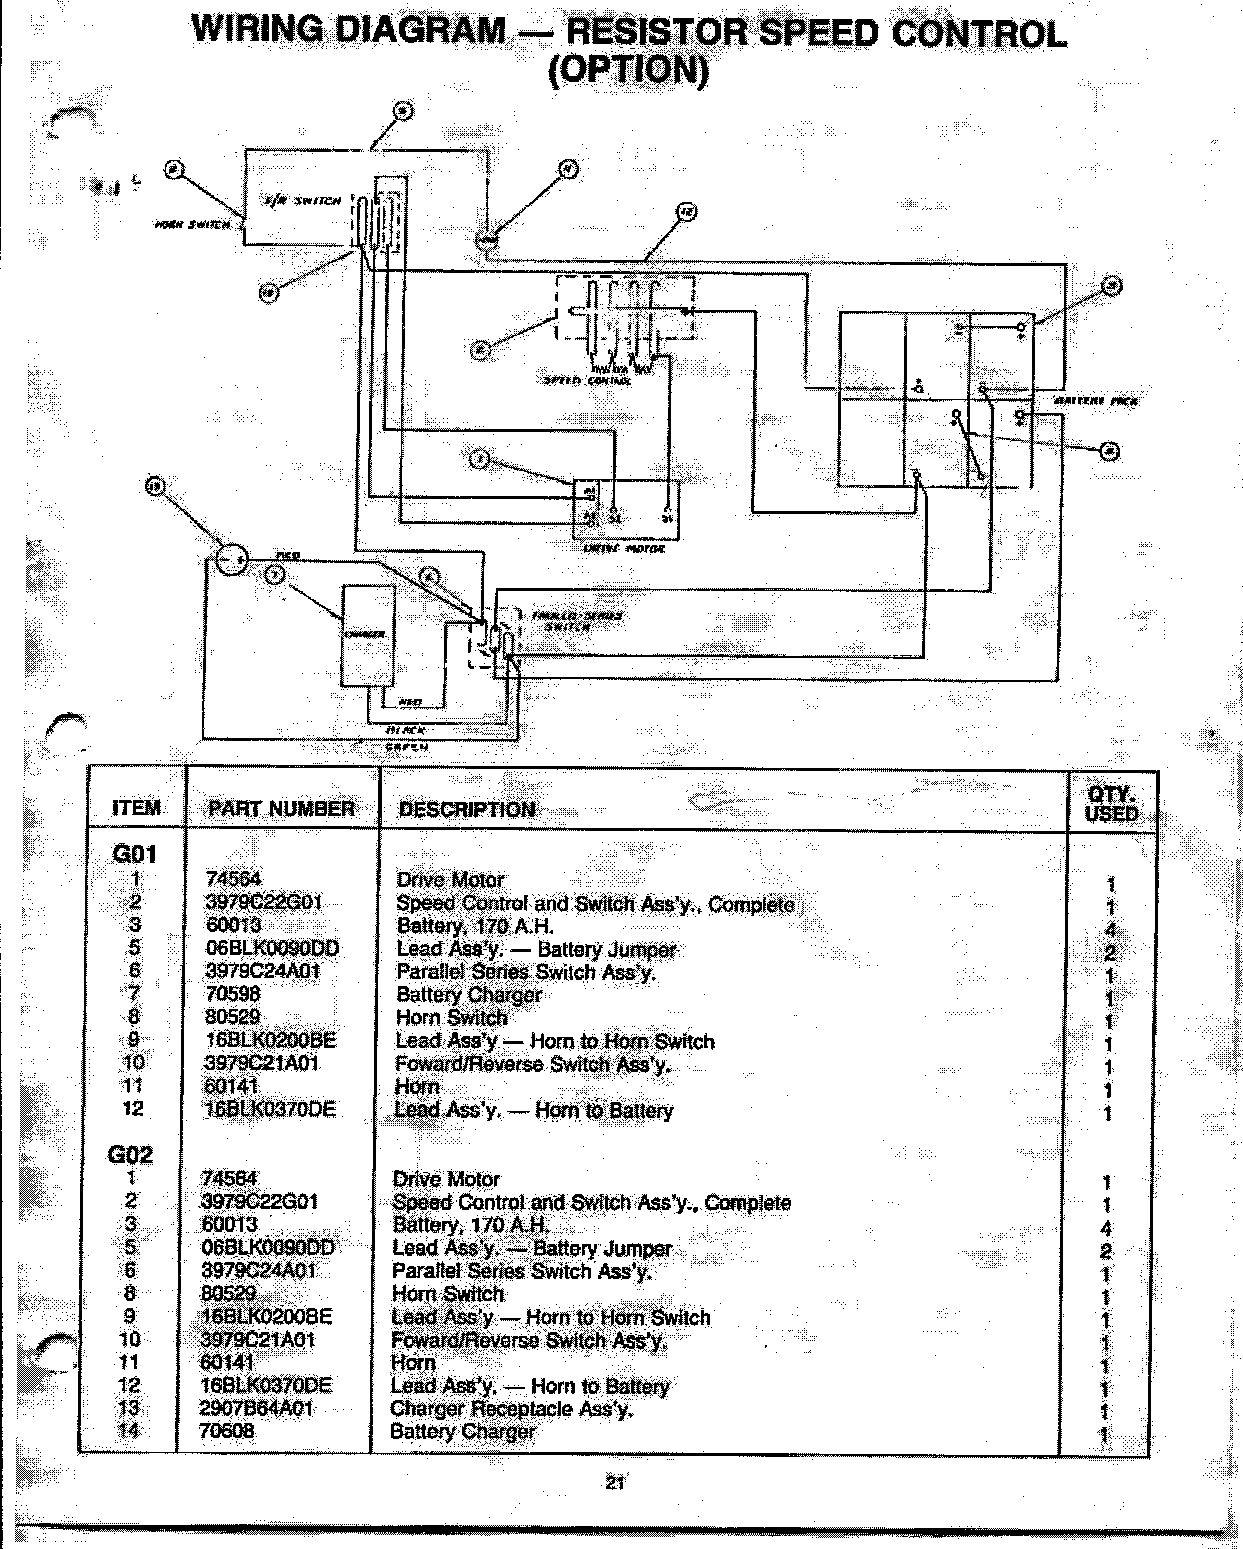 Taylor Dunn Wiring Diagram / Vintagegolfcartparts Com : A